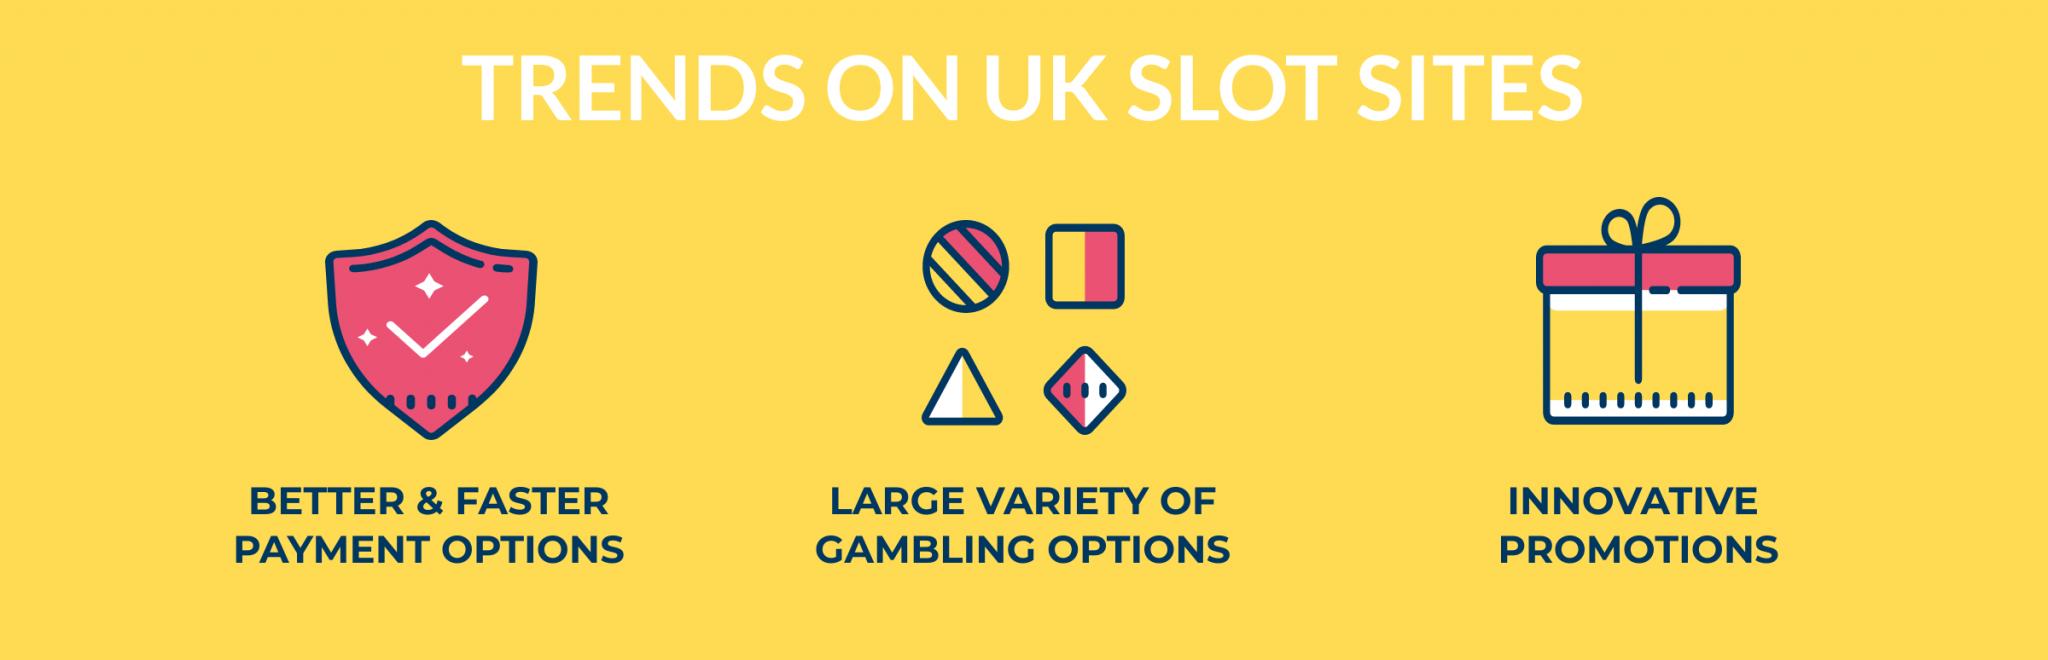 trends on uk slot sites